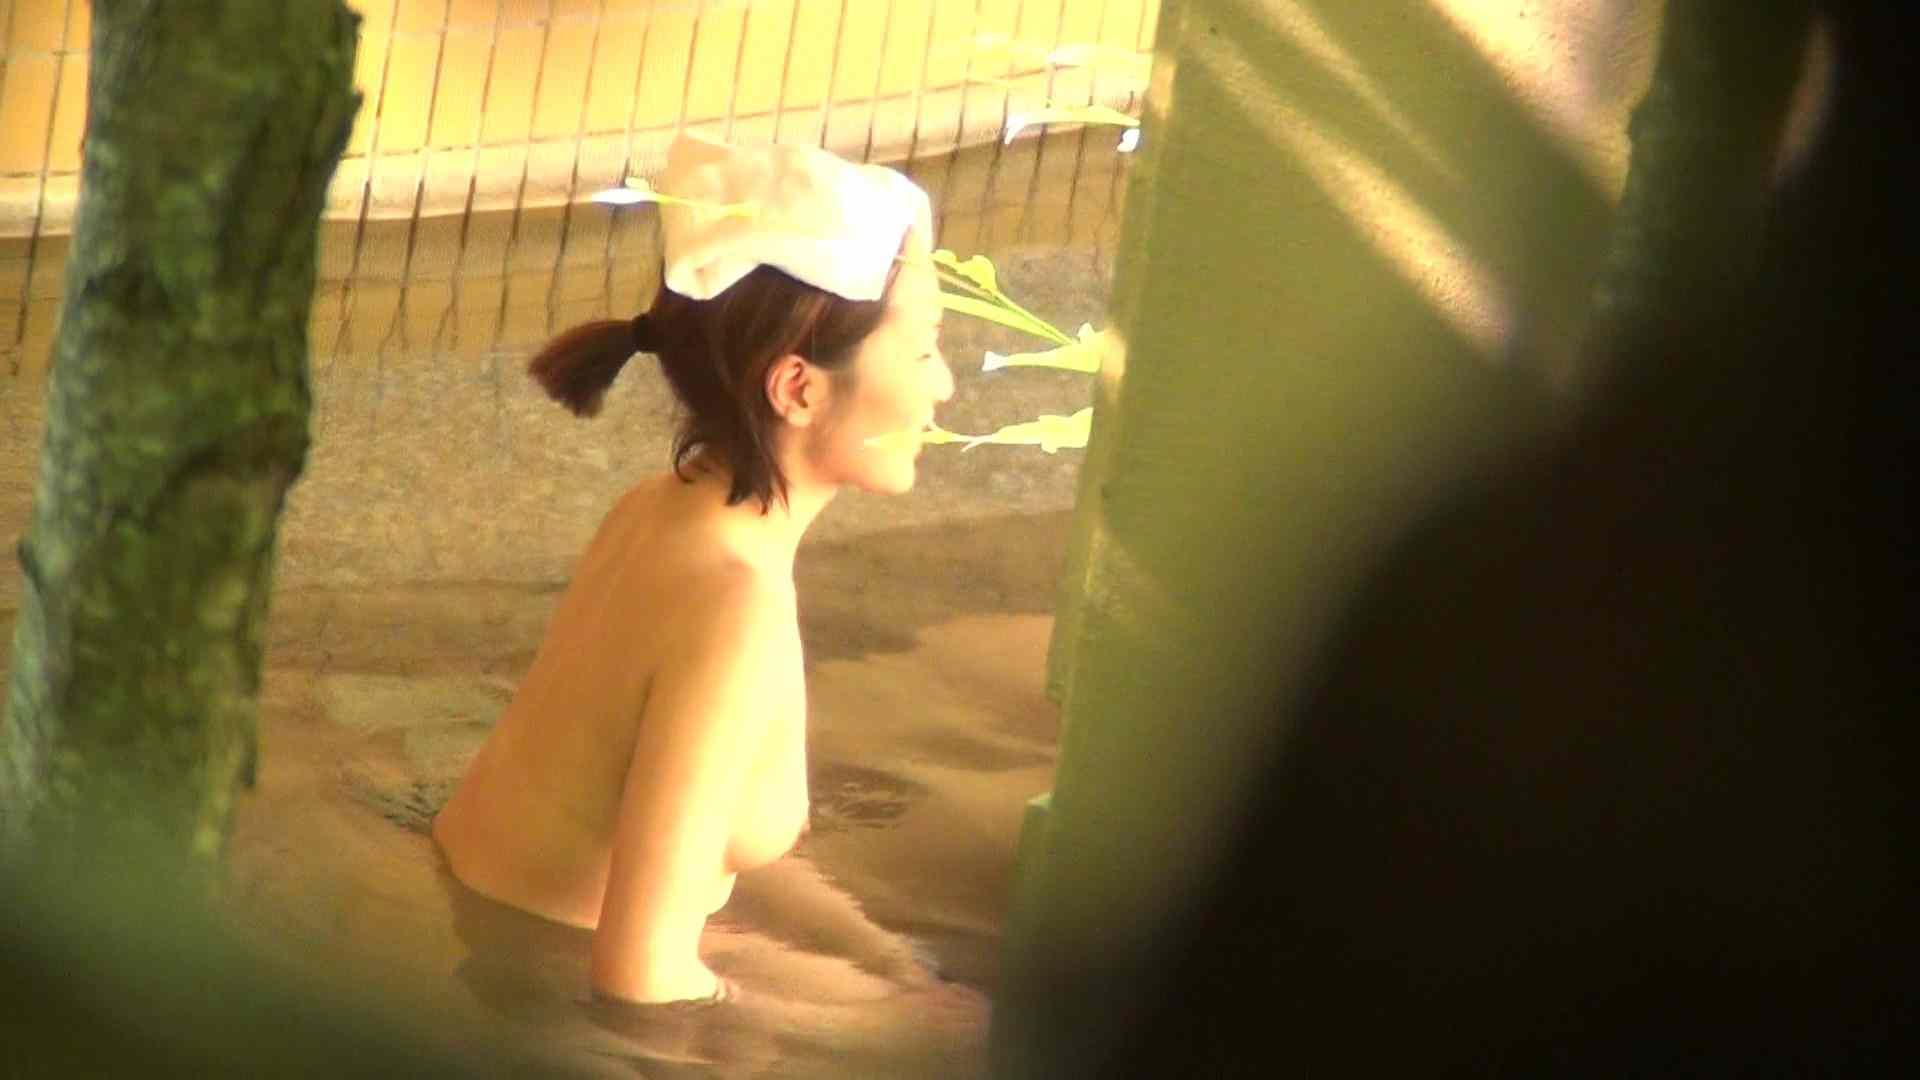 Aquaな露天風呂Vol.284 綺麗なOLたち ワレメ動画紹介 61枚 11